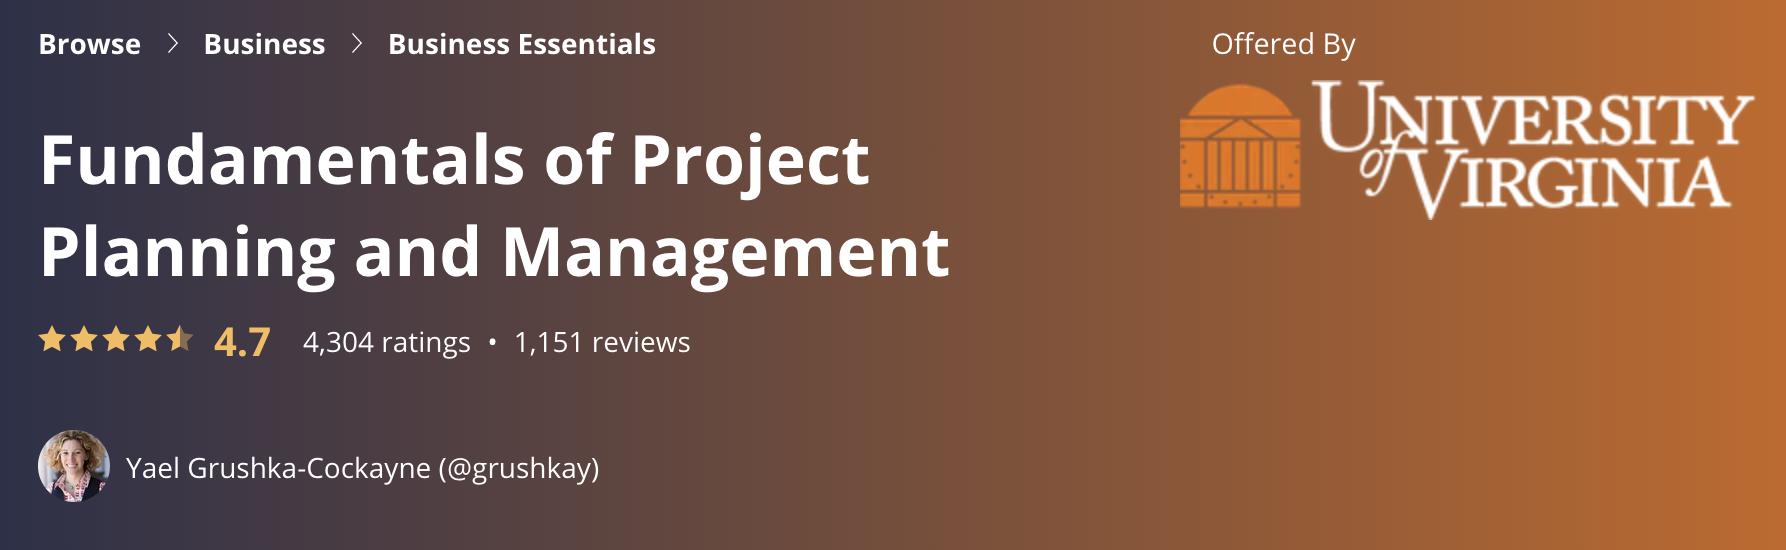 Project Management Training Free - University of Virginia